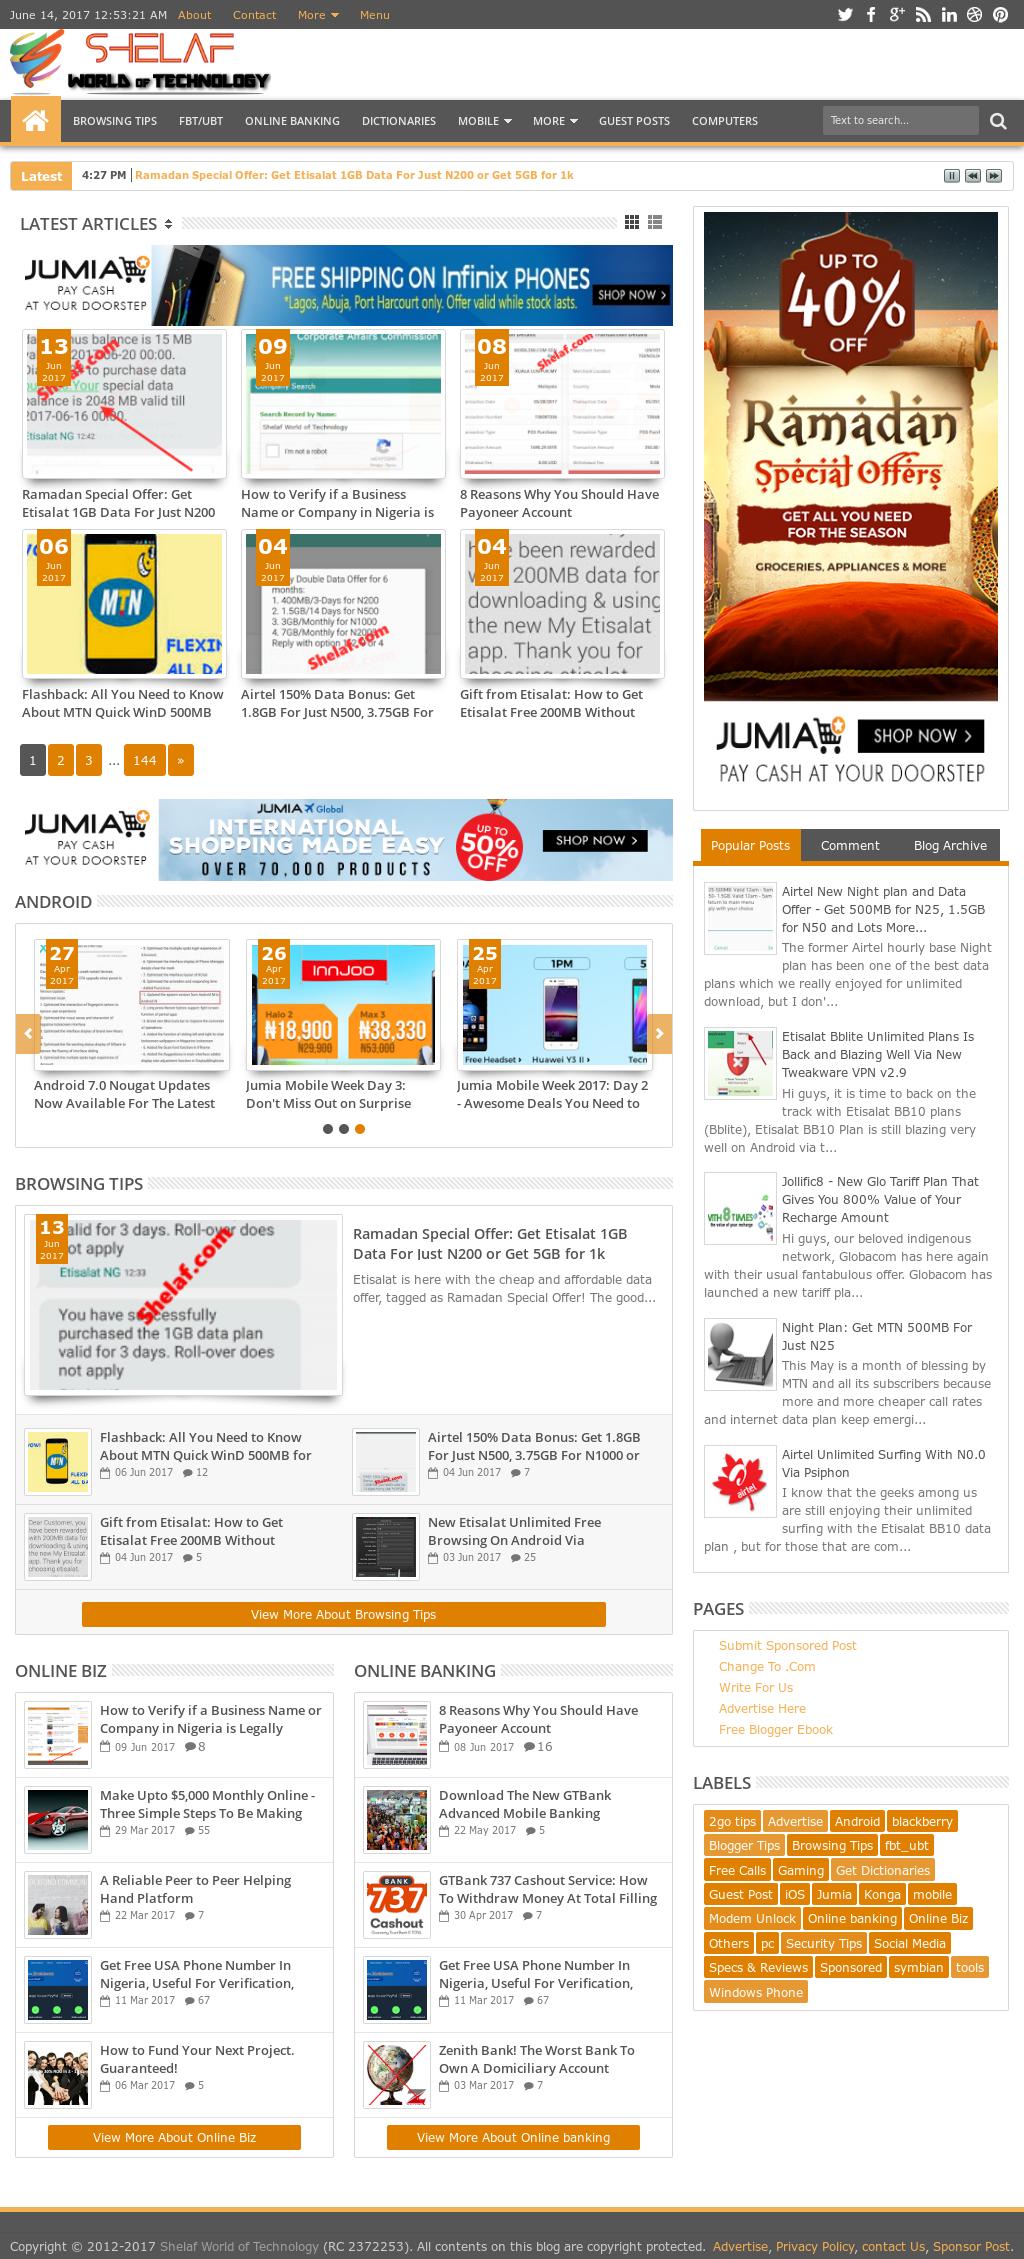 Owler Reports - Shelaf World Of Technology Blog Tough 40